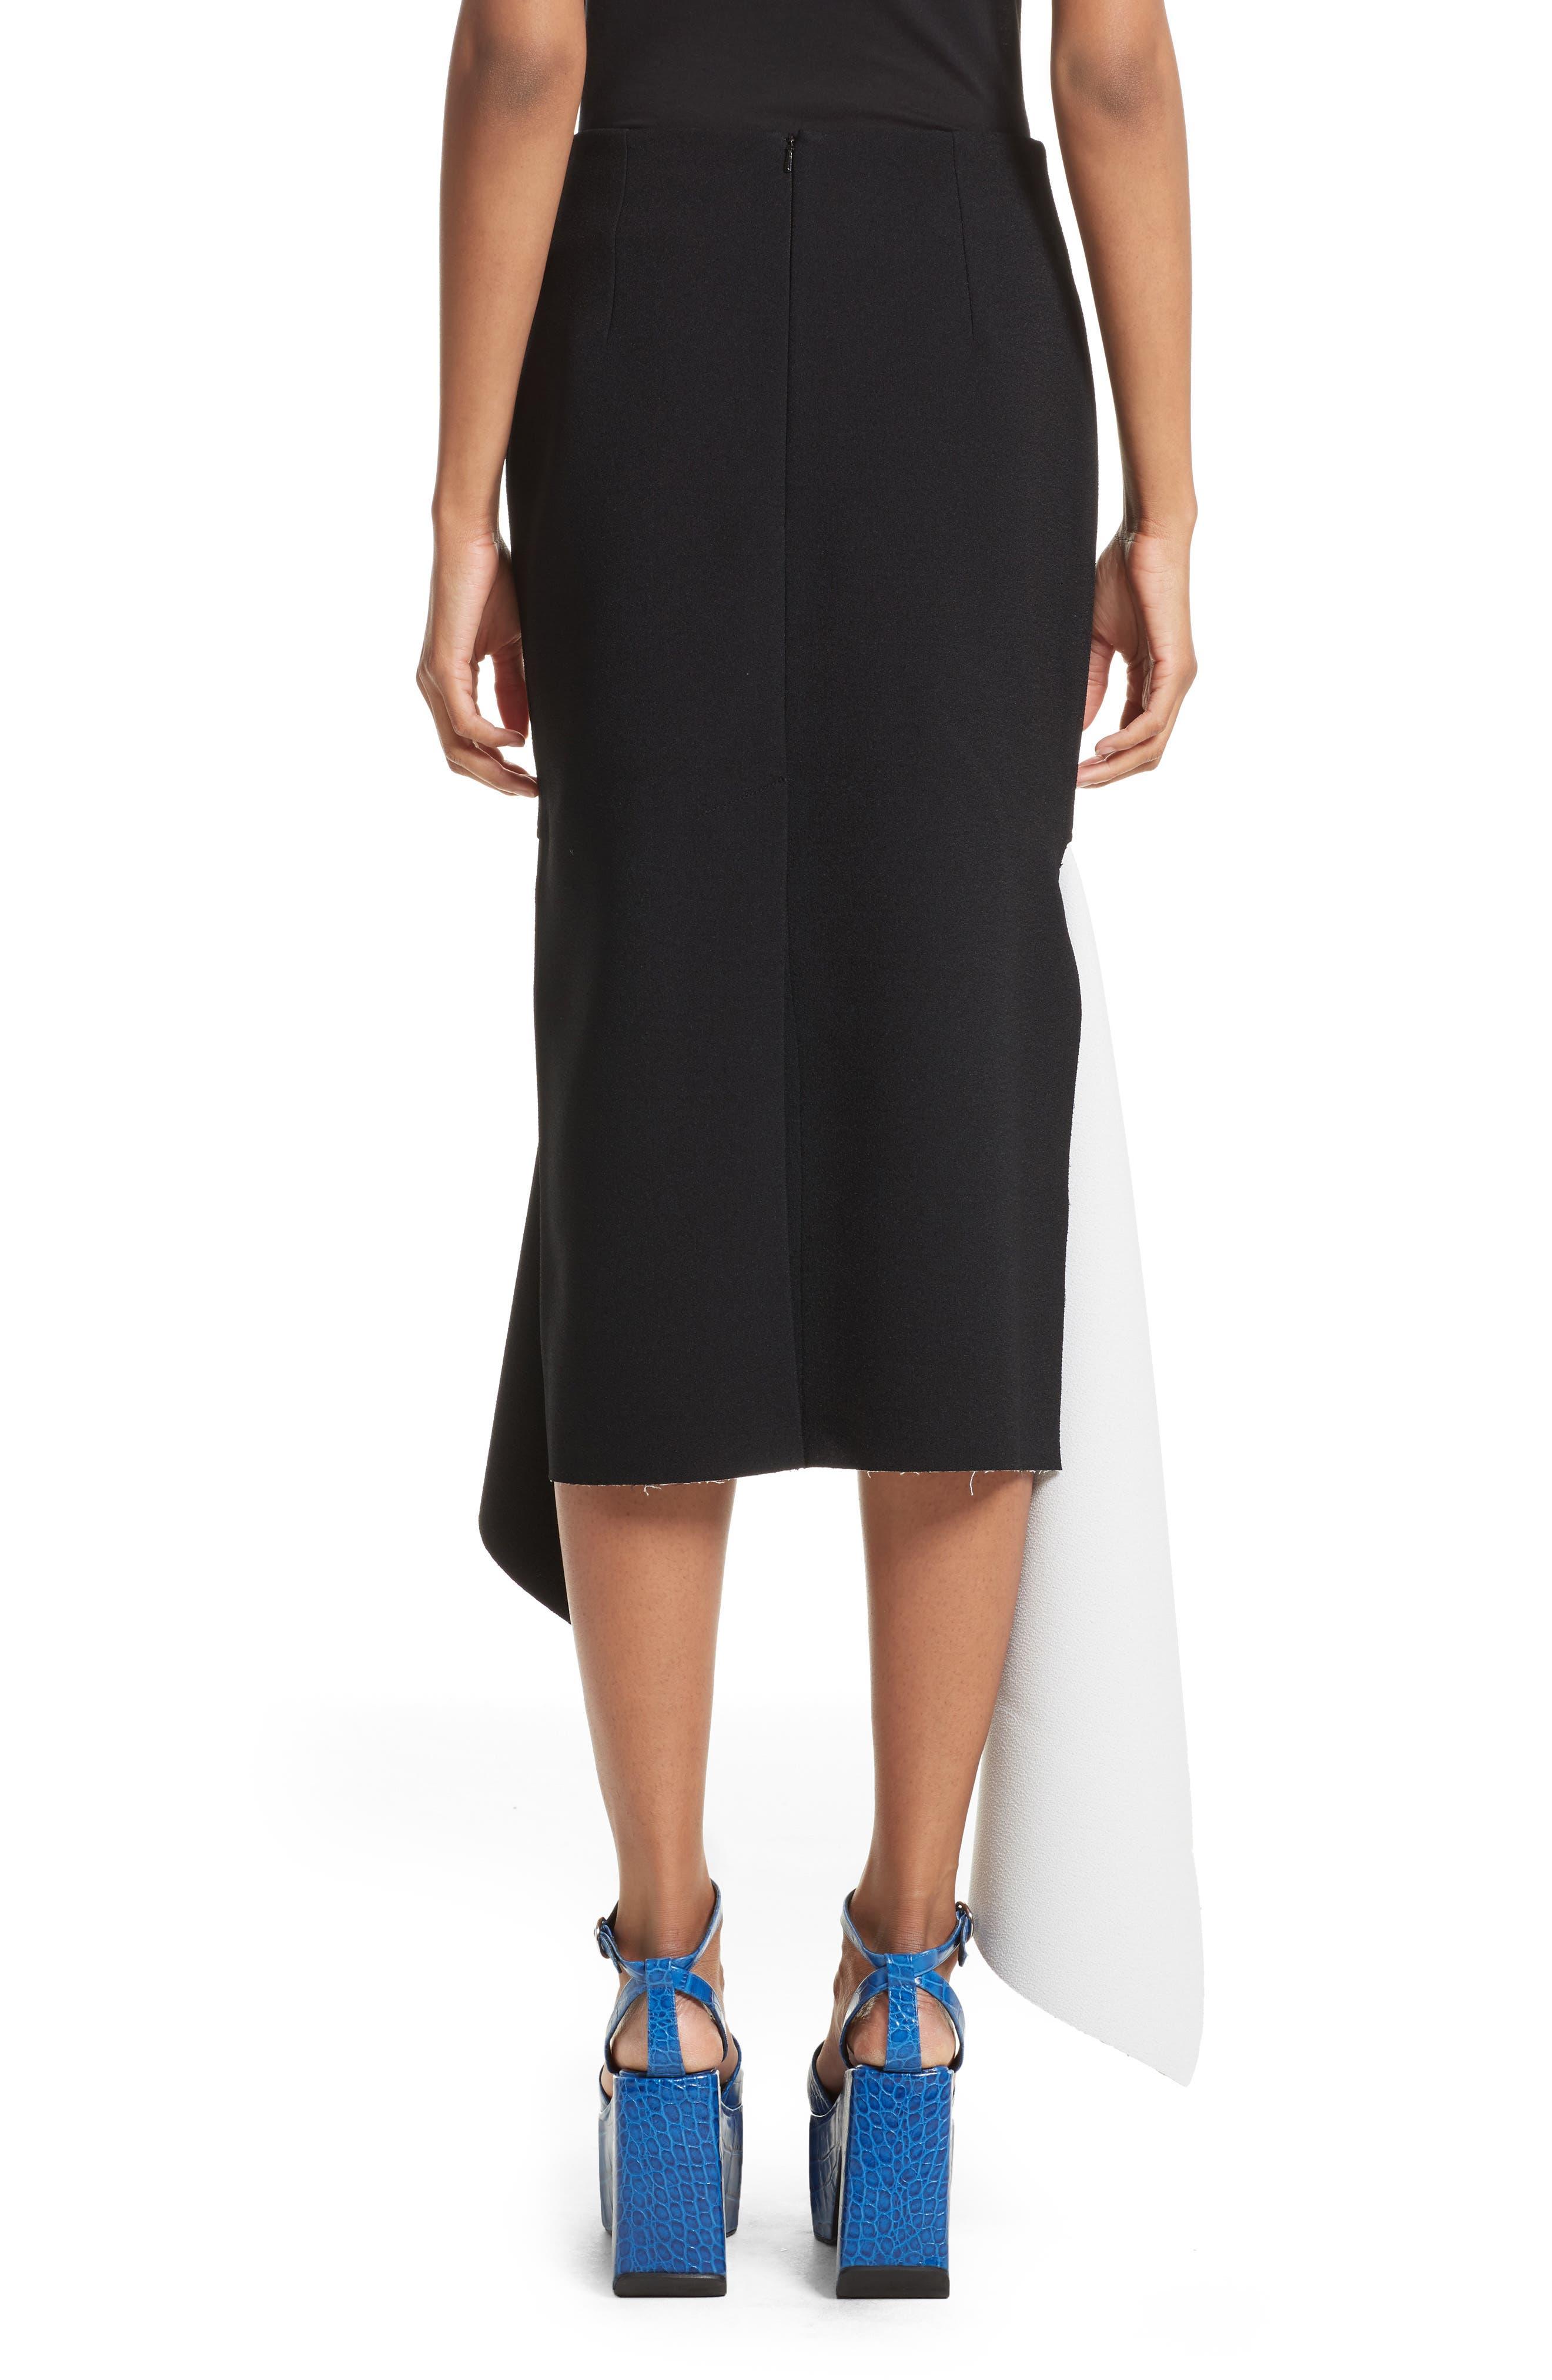 Marques'Almeida Asymmetrical Bicolor Crepe Skirt,                             Alternate thumbnail 2, color,                             003